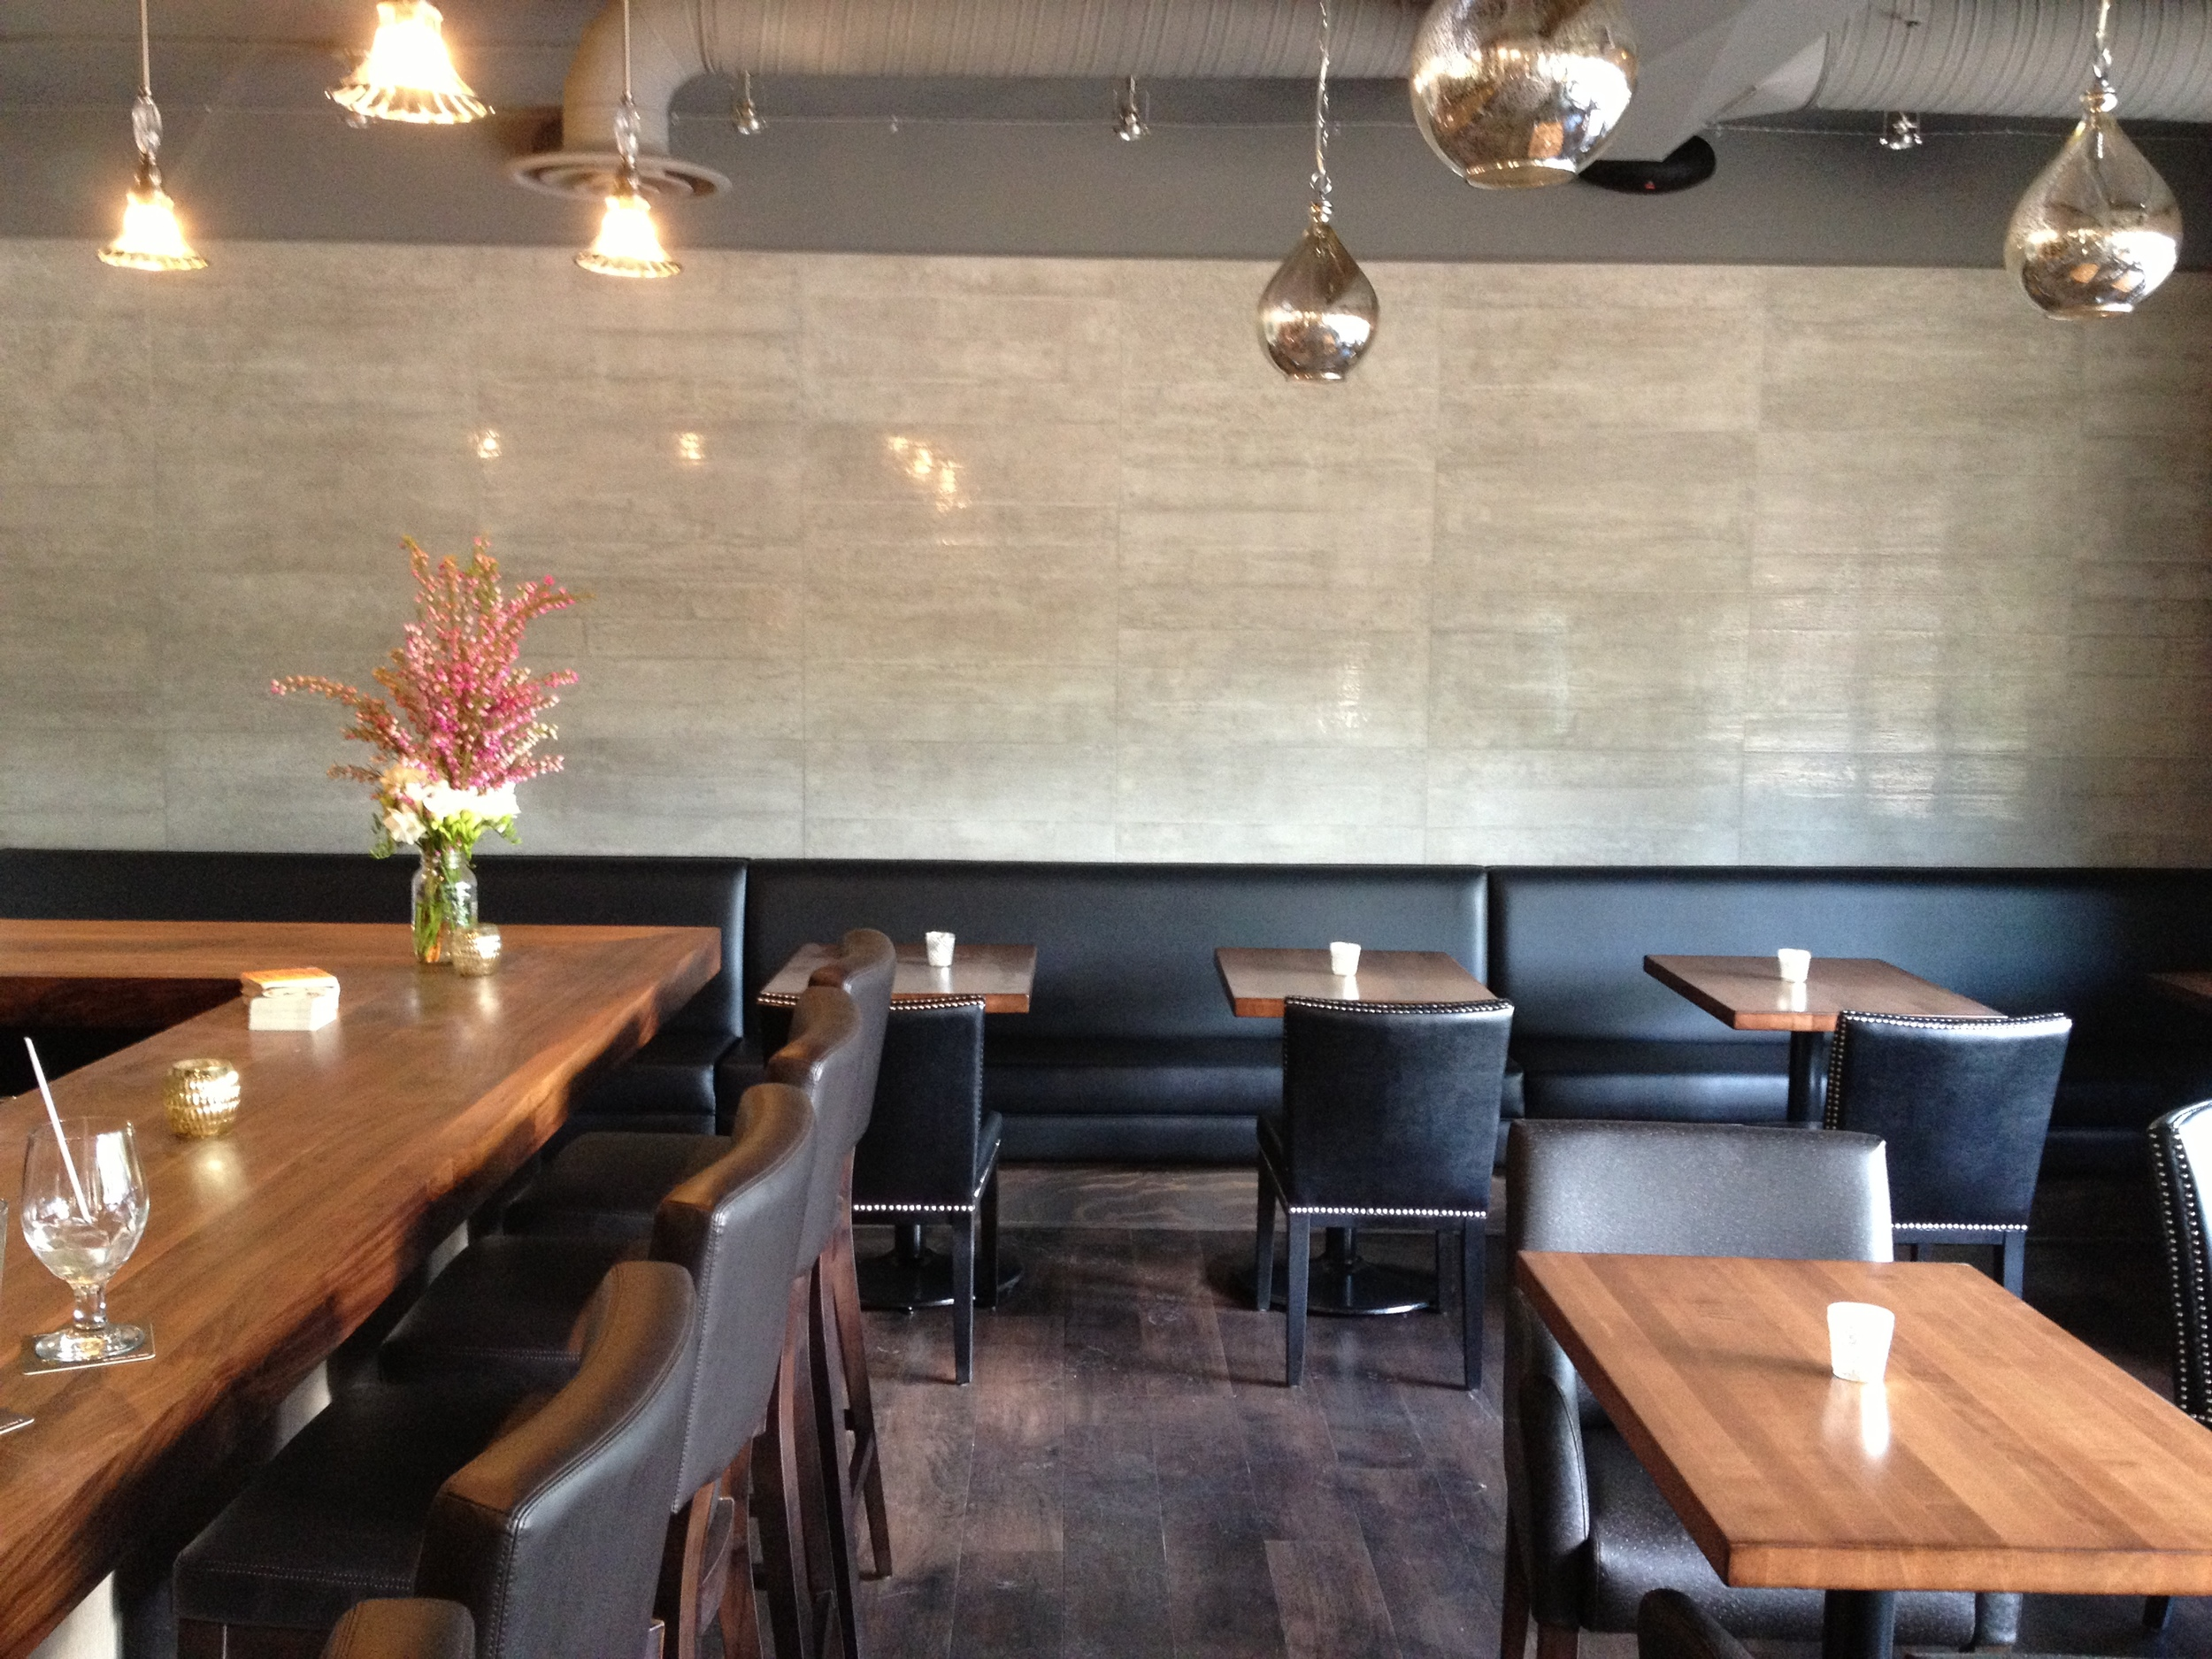 Polished concrete look tile, custom walnut bar top, black leather floating bench seat.